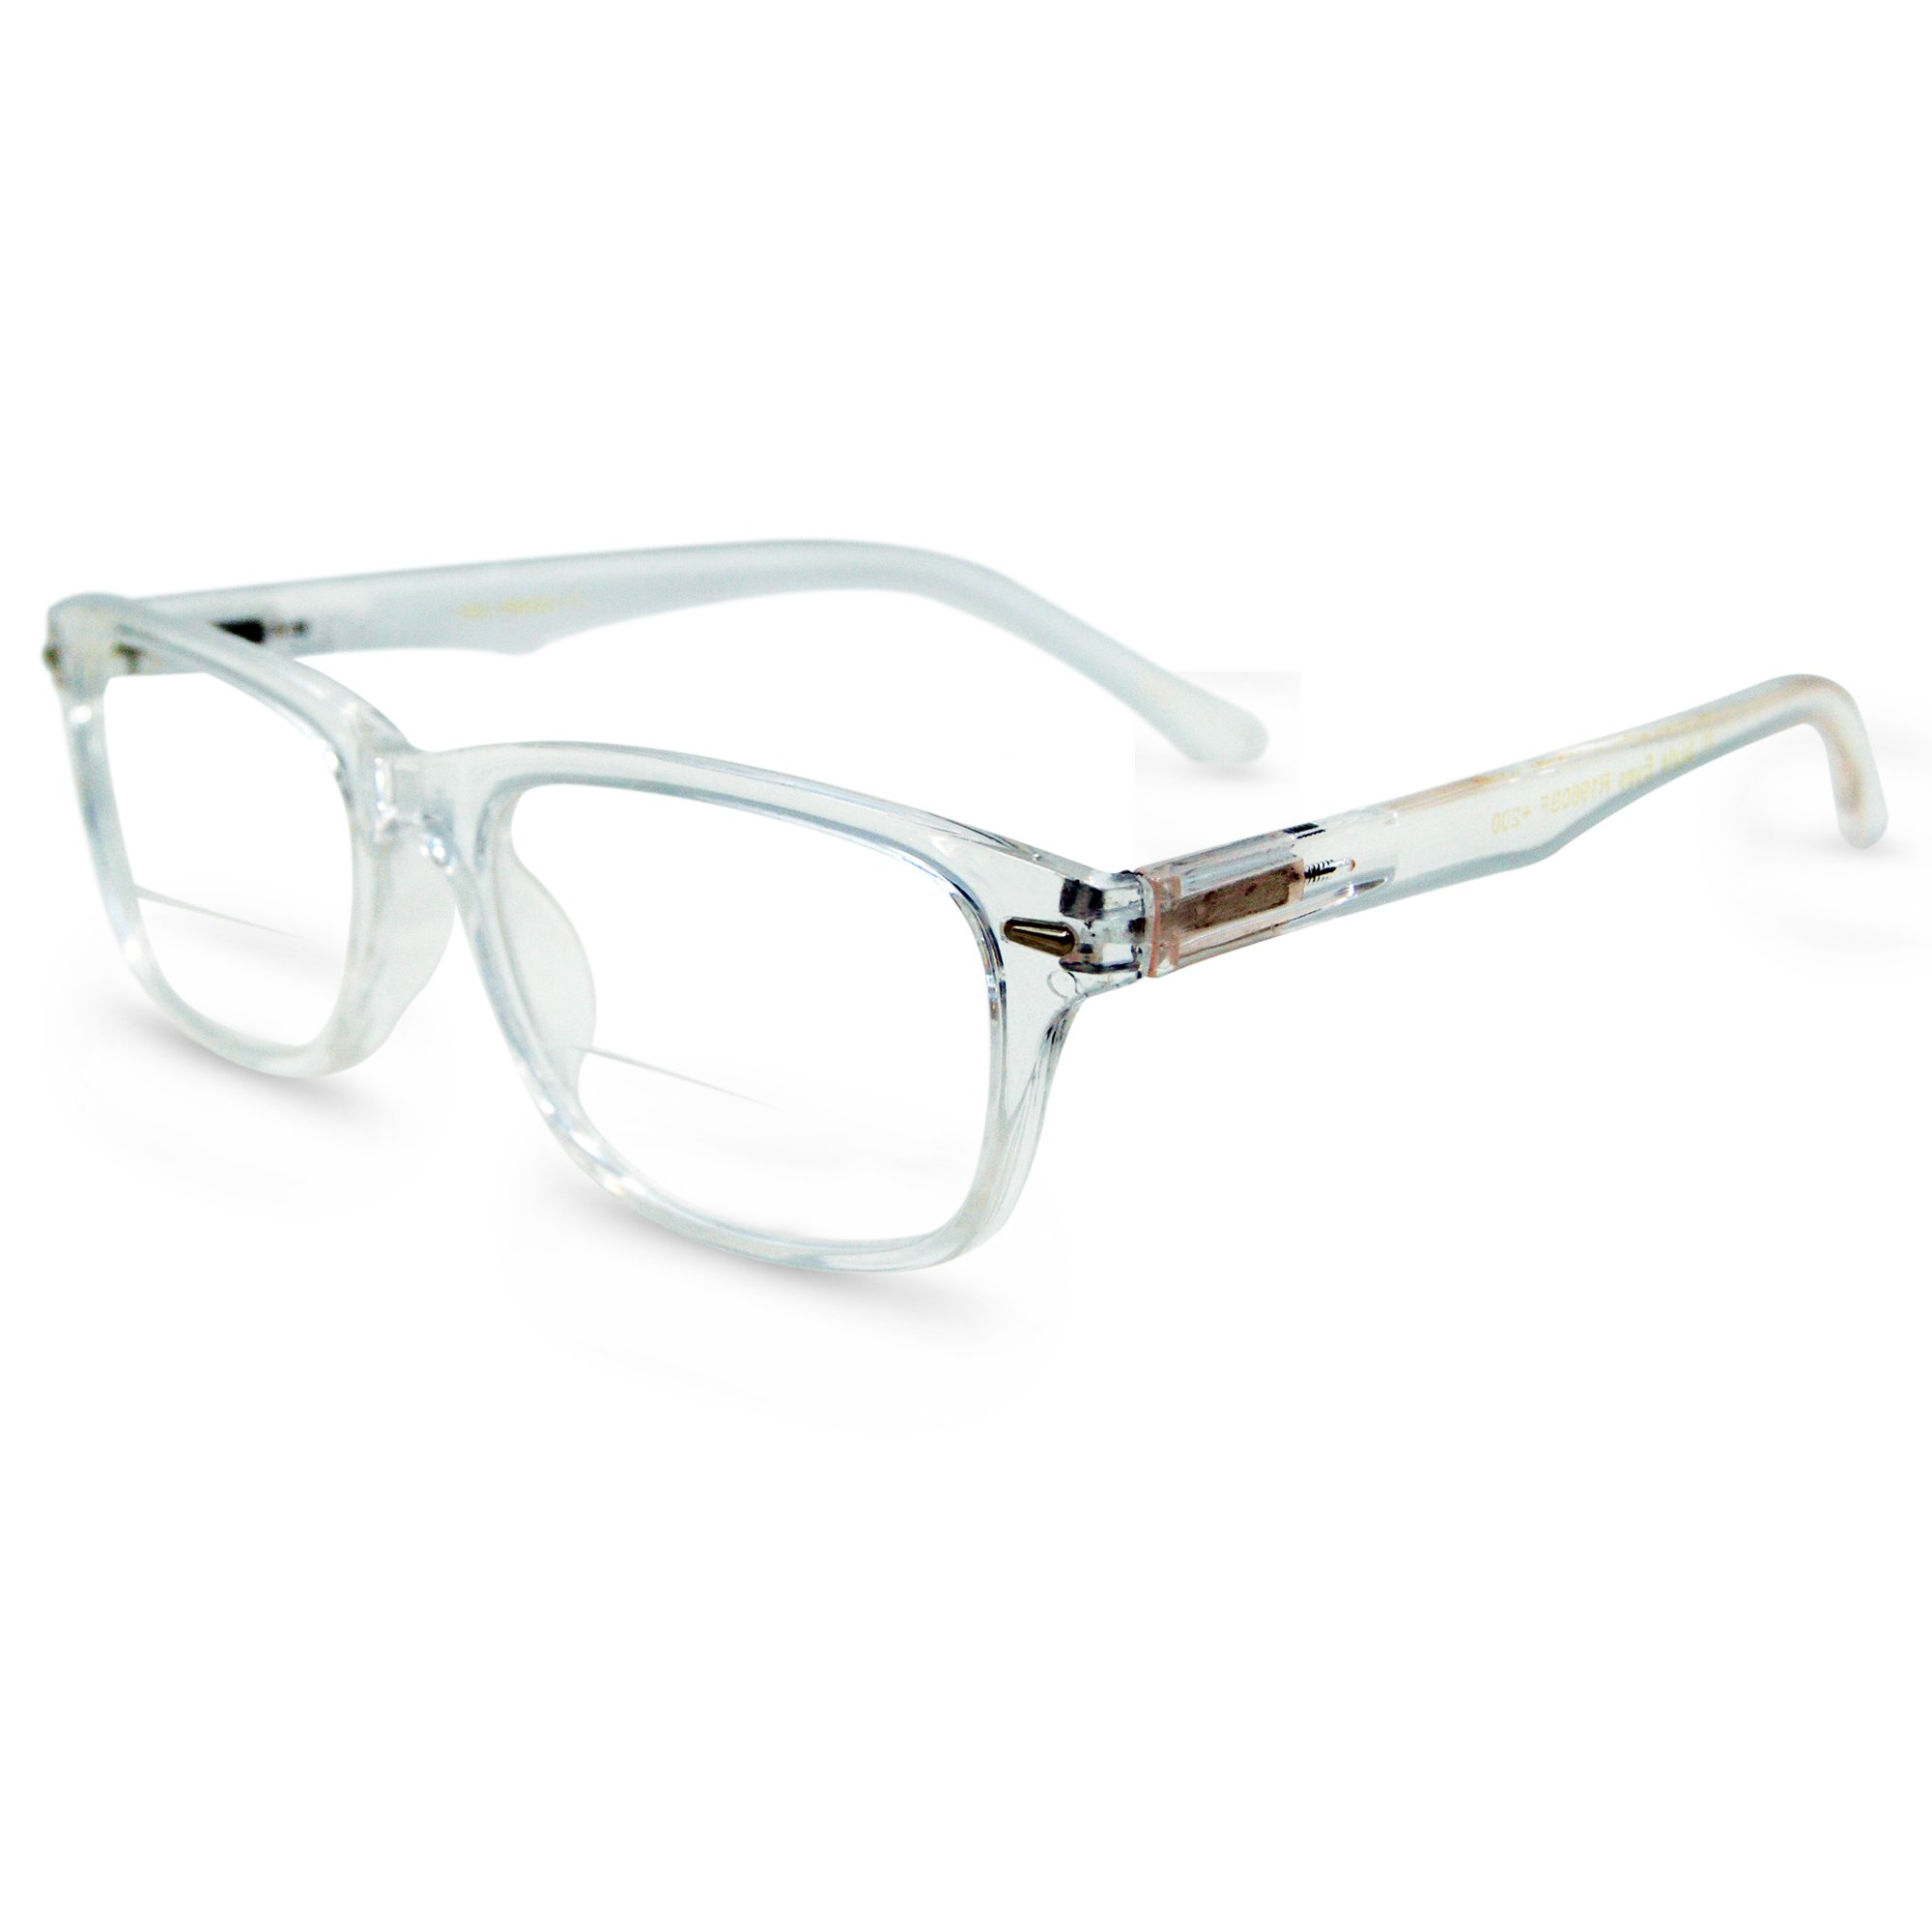 In Style Eyes Seymore Wayfarer BiFocal Reading Glasses Clear 4.00